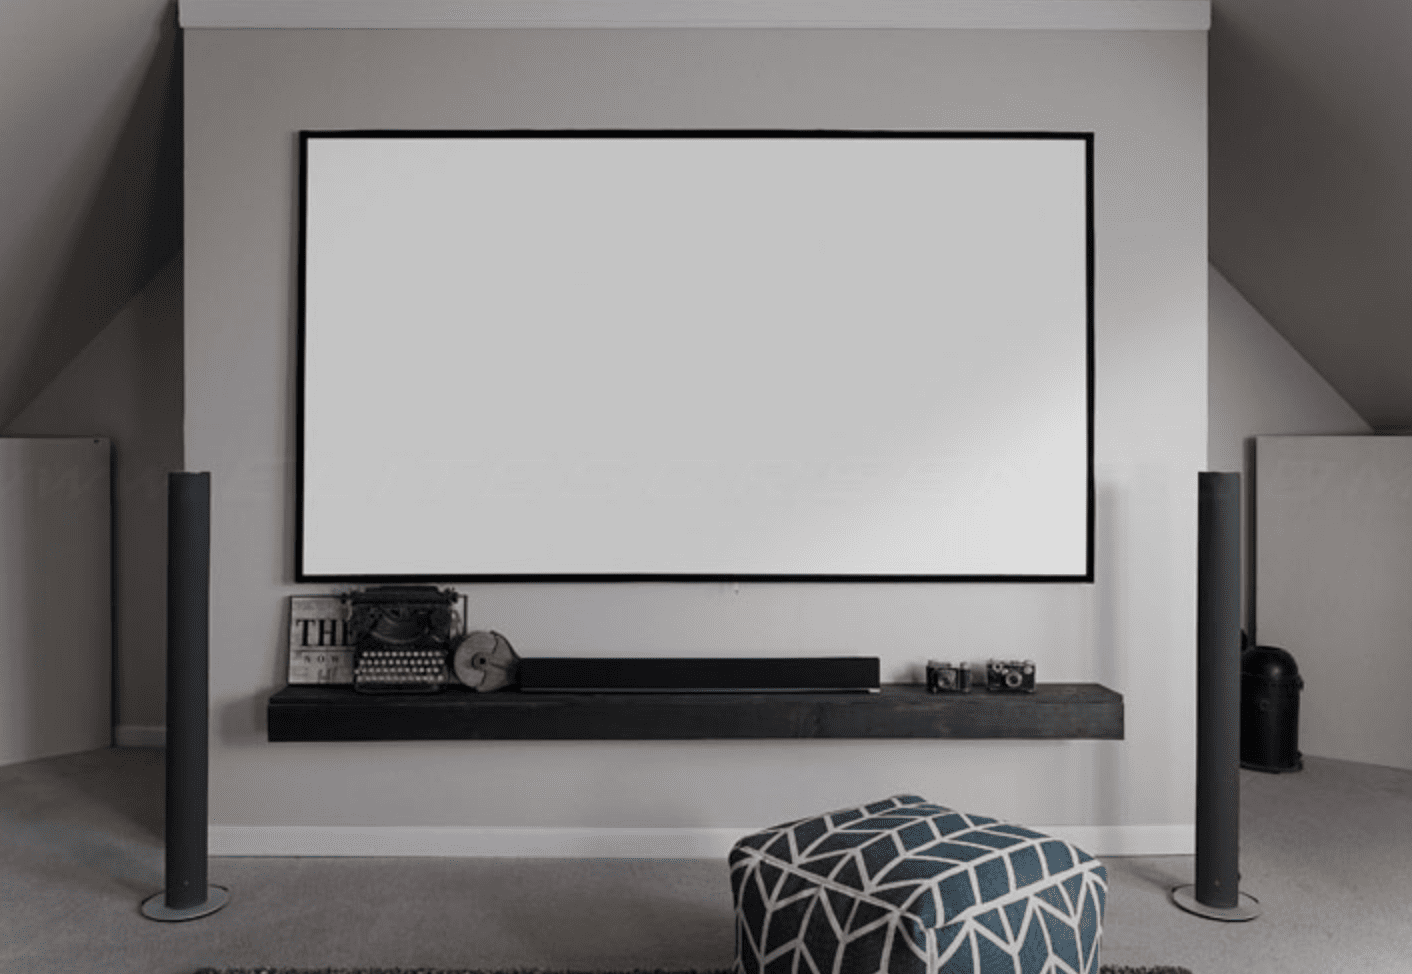 Elite Screens Aeon Edge Free Fixed Projector Screen 100 In 2021 Fixed Projector Screen Projector Screen Projection Screen